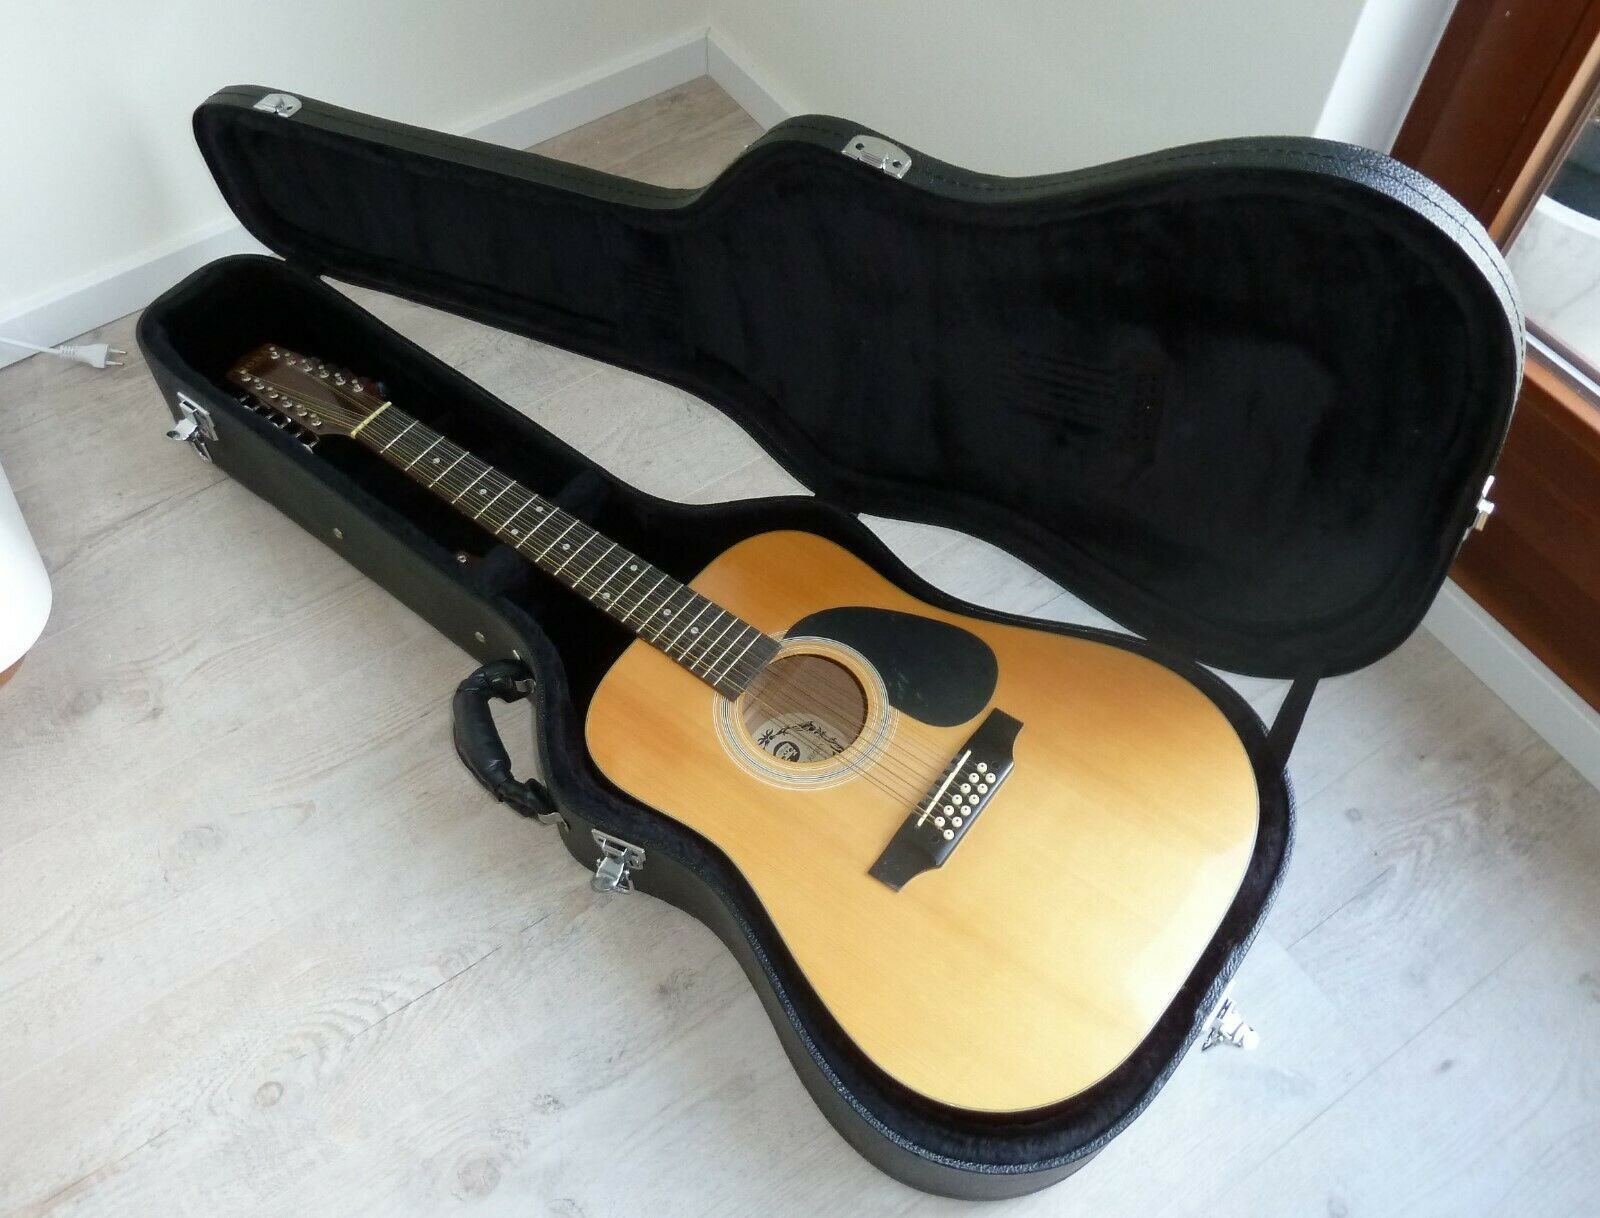 Akustikgitarre, Konzertgitarre, Westerngitarre, Gitarre - Hora S.A.Reghin